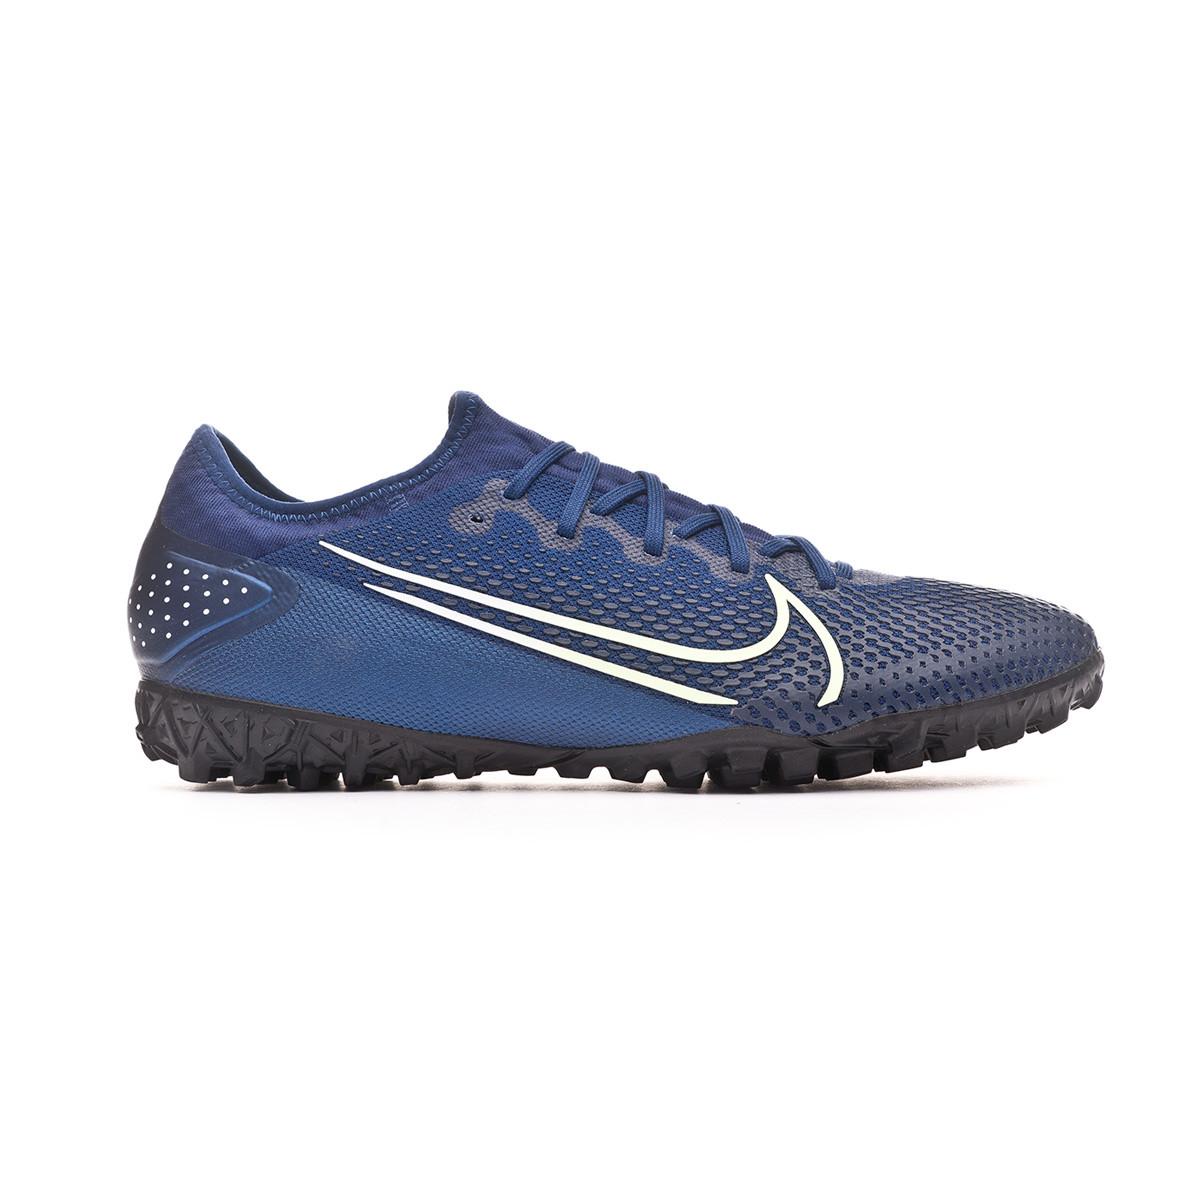 Chaussure de foot Nike Mercurial Vapor XIII Pro MDS Turf